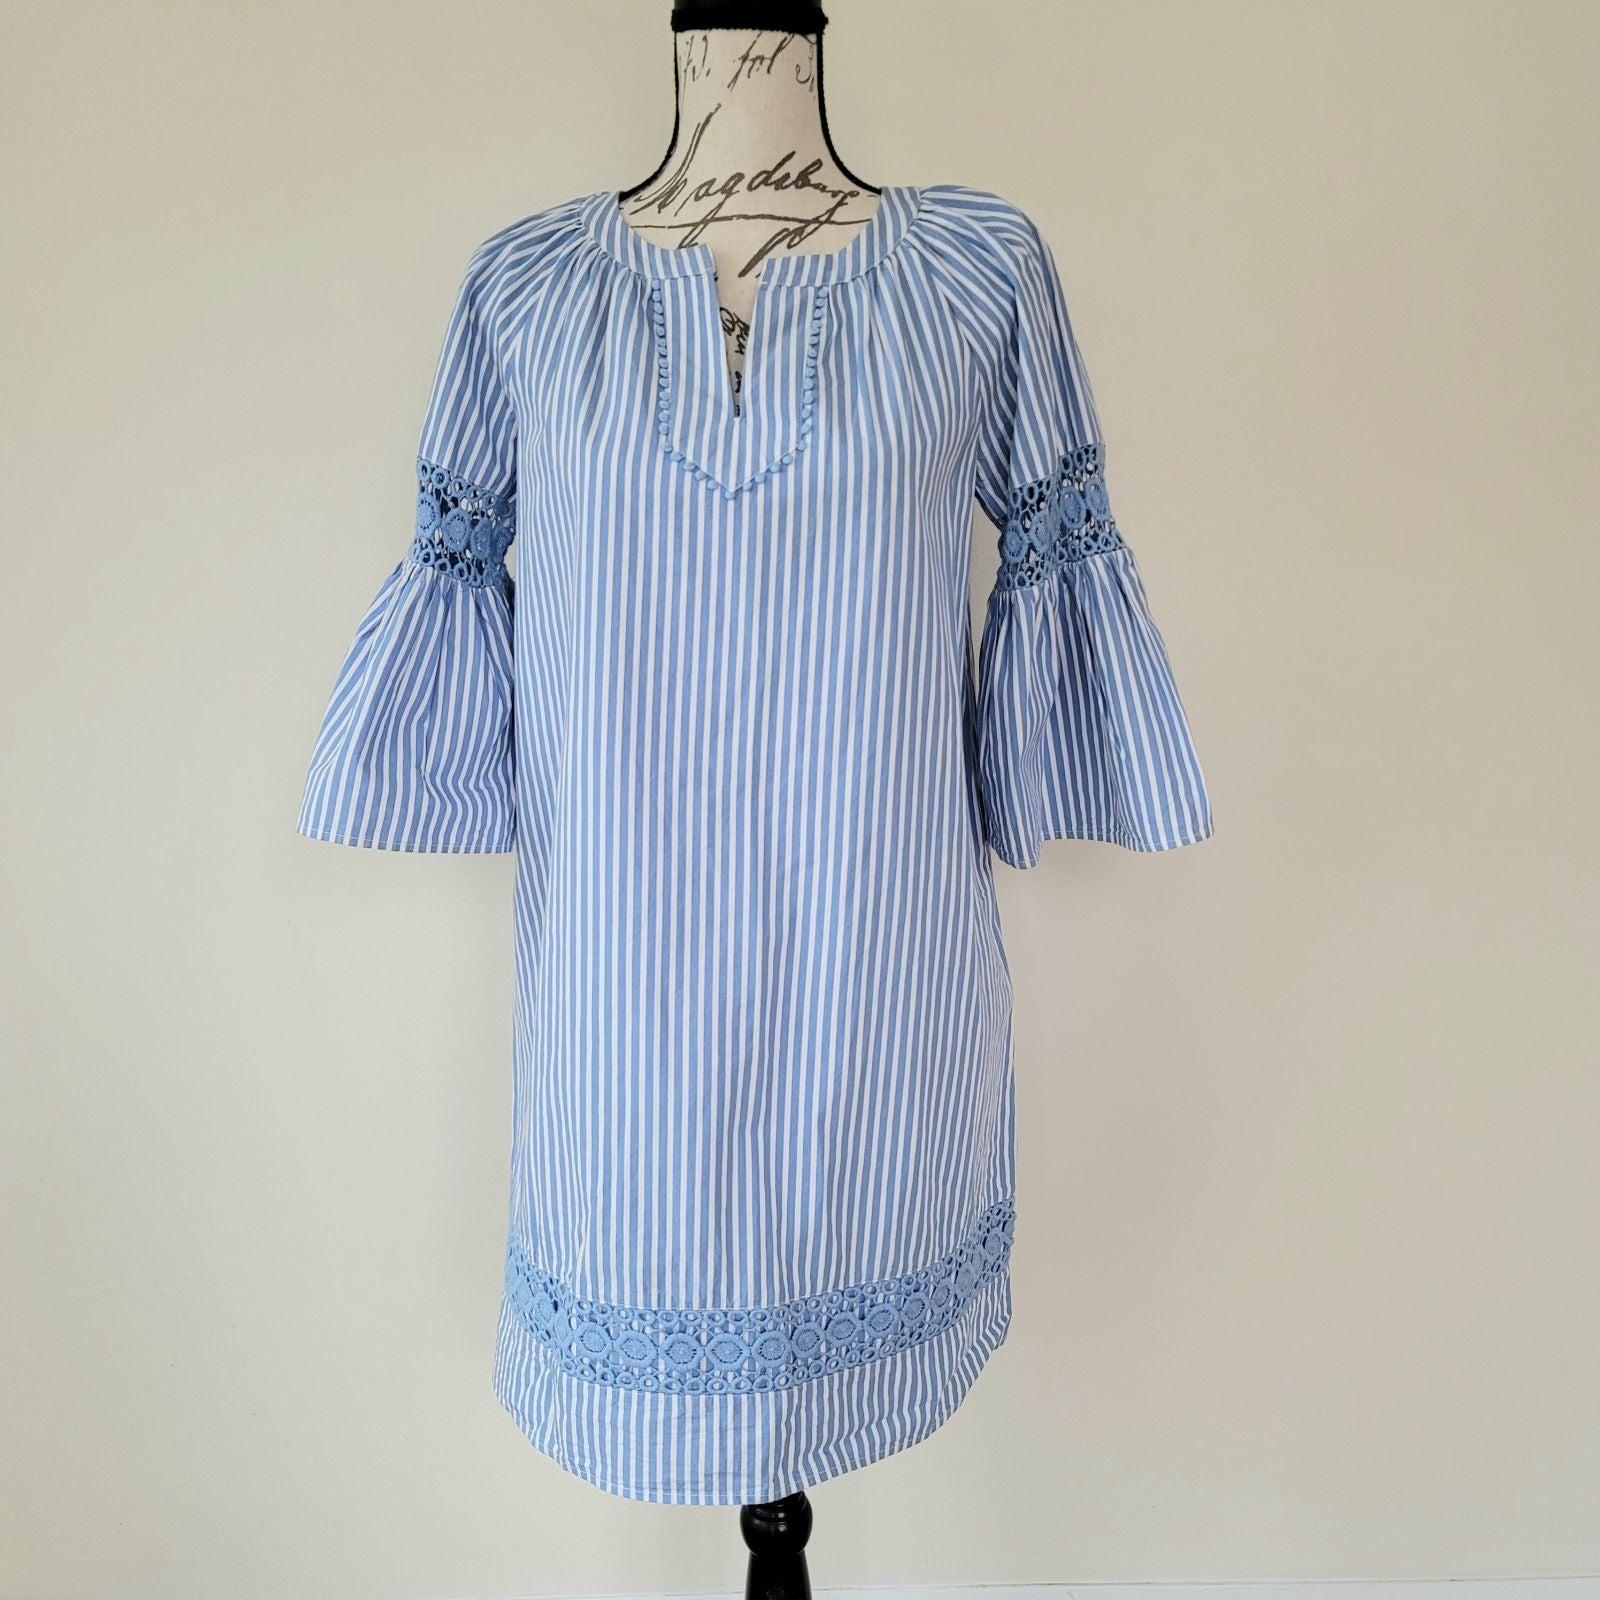 Crown & Ivy Striped Eyelet Blue Dress S